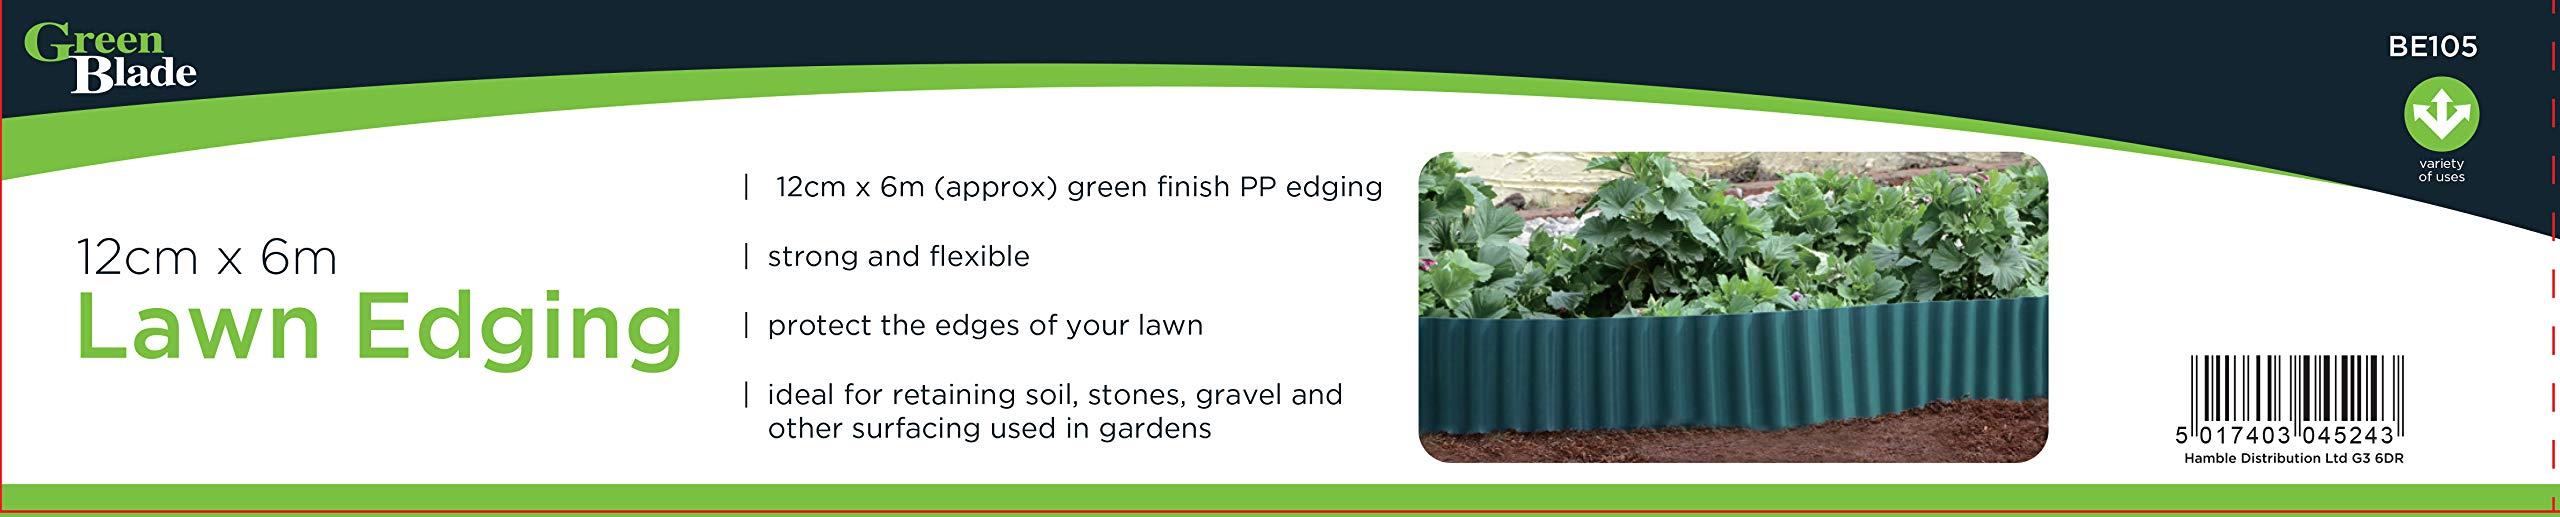 PLASTIC EDGING GARDEN LAWN GRASS DECORATIVE FLEXIBLE PRETTY 12CM X 6M